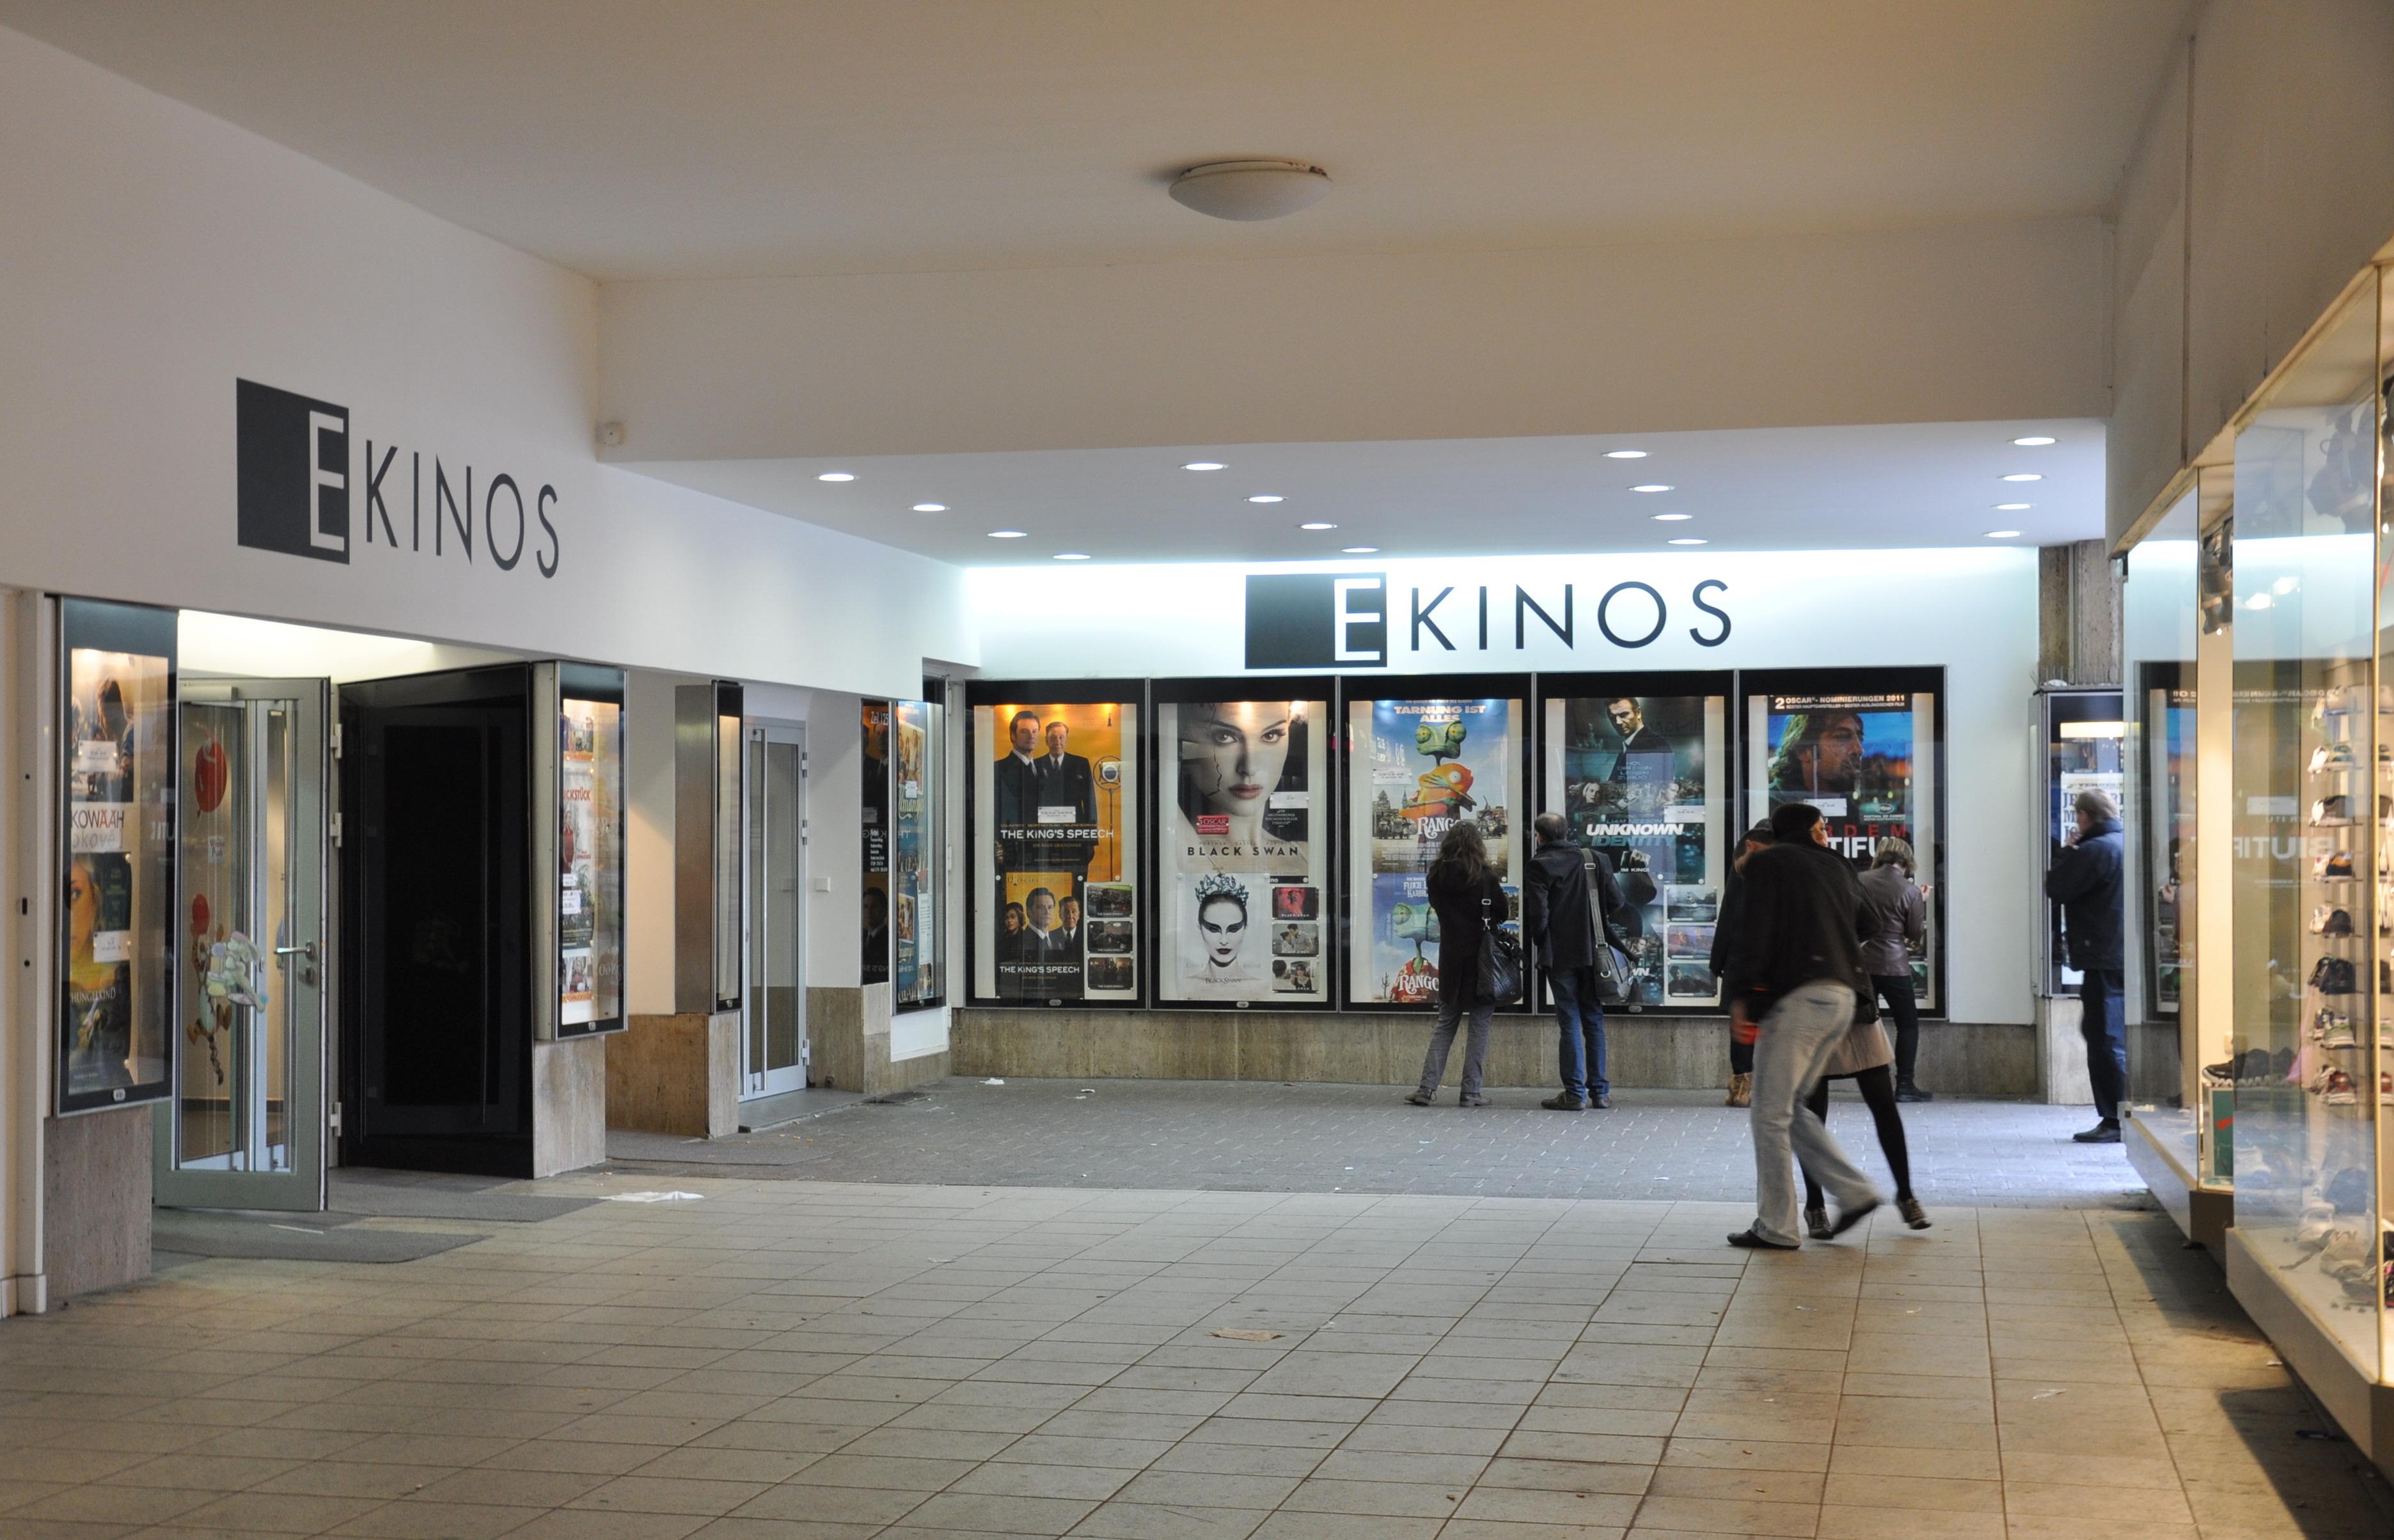 https://upload.wikimedia.org/wikipedia/commons/4/49/Frankfurt_E-Kinos_2.jpg